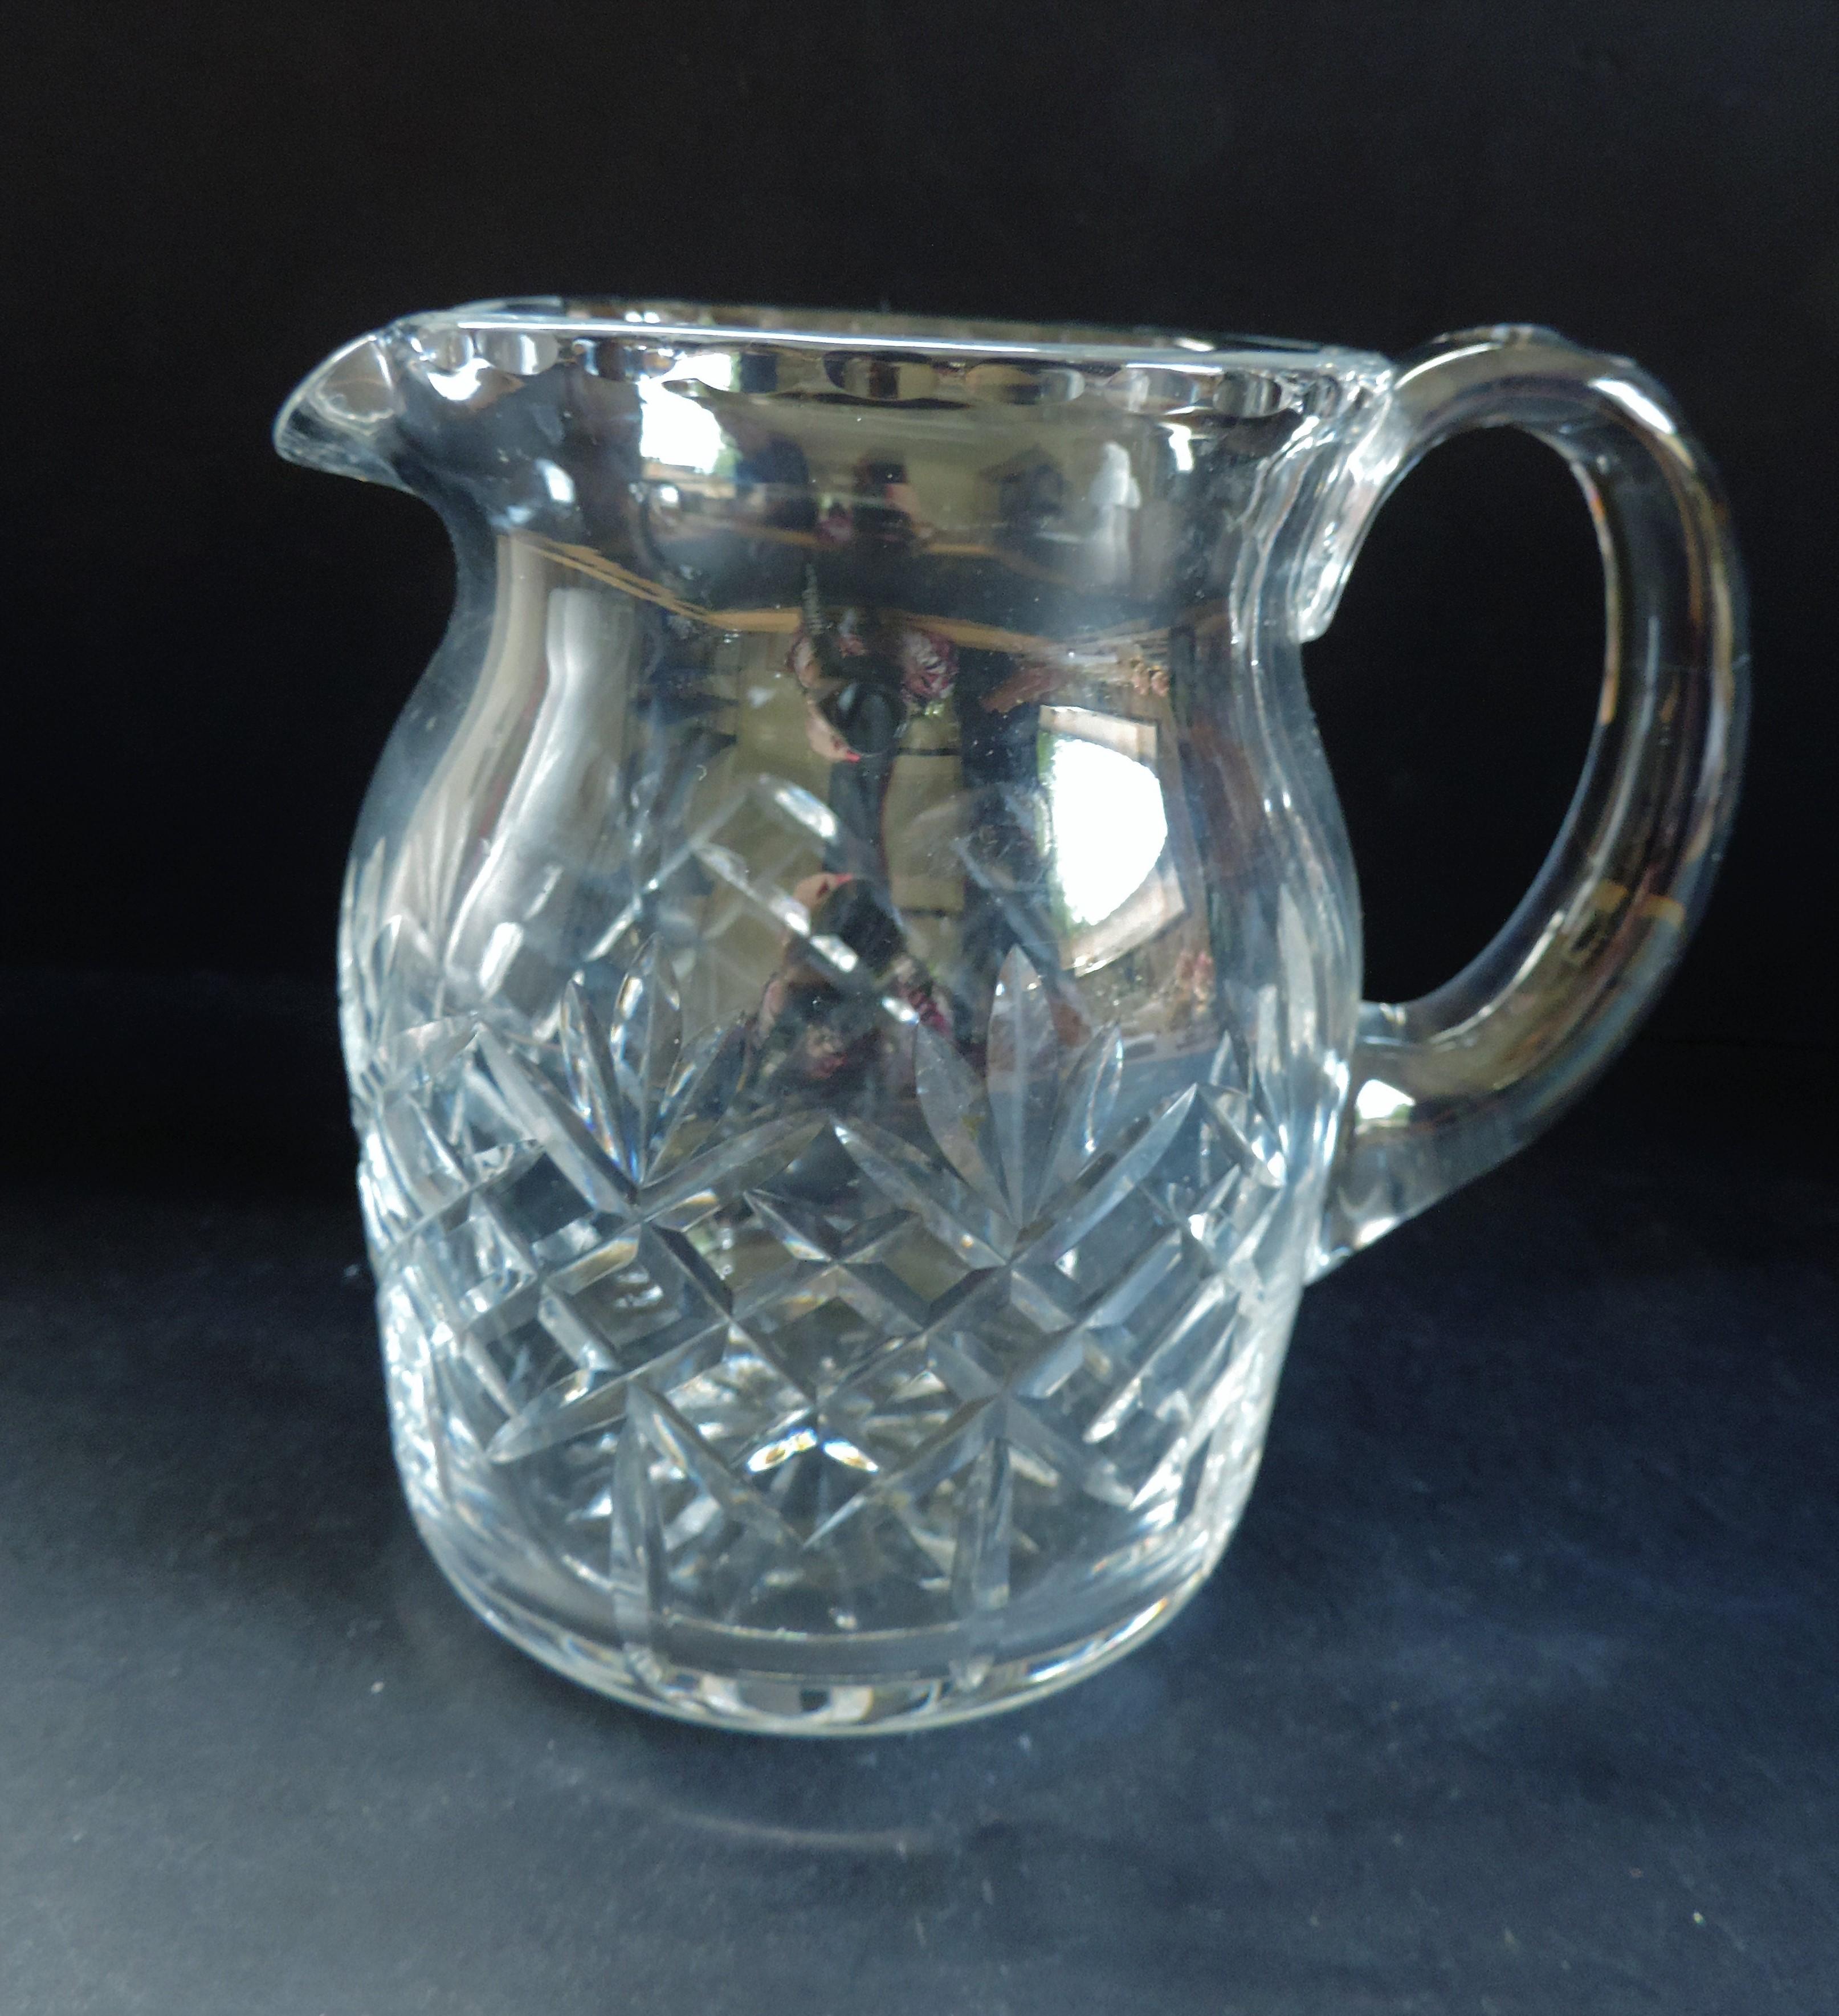 Vintage Crystal Drinks Jug/Pitcher 15cm tall - Image 2 of 5